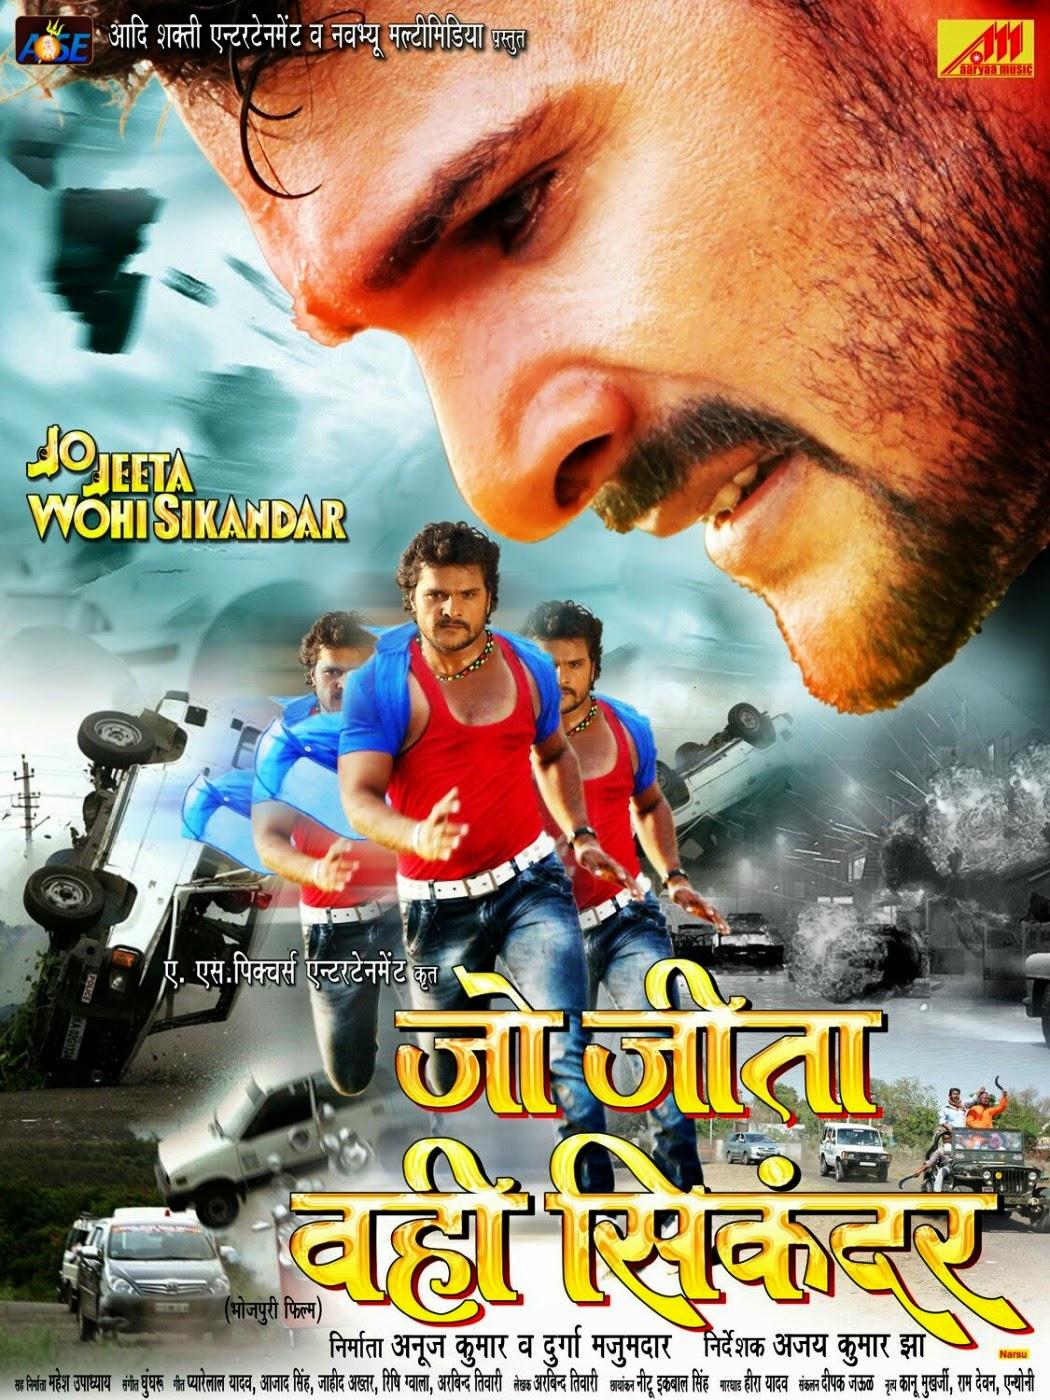 bhojpuri movie poster of Jo Jeeta Wohi Sikandar